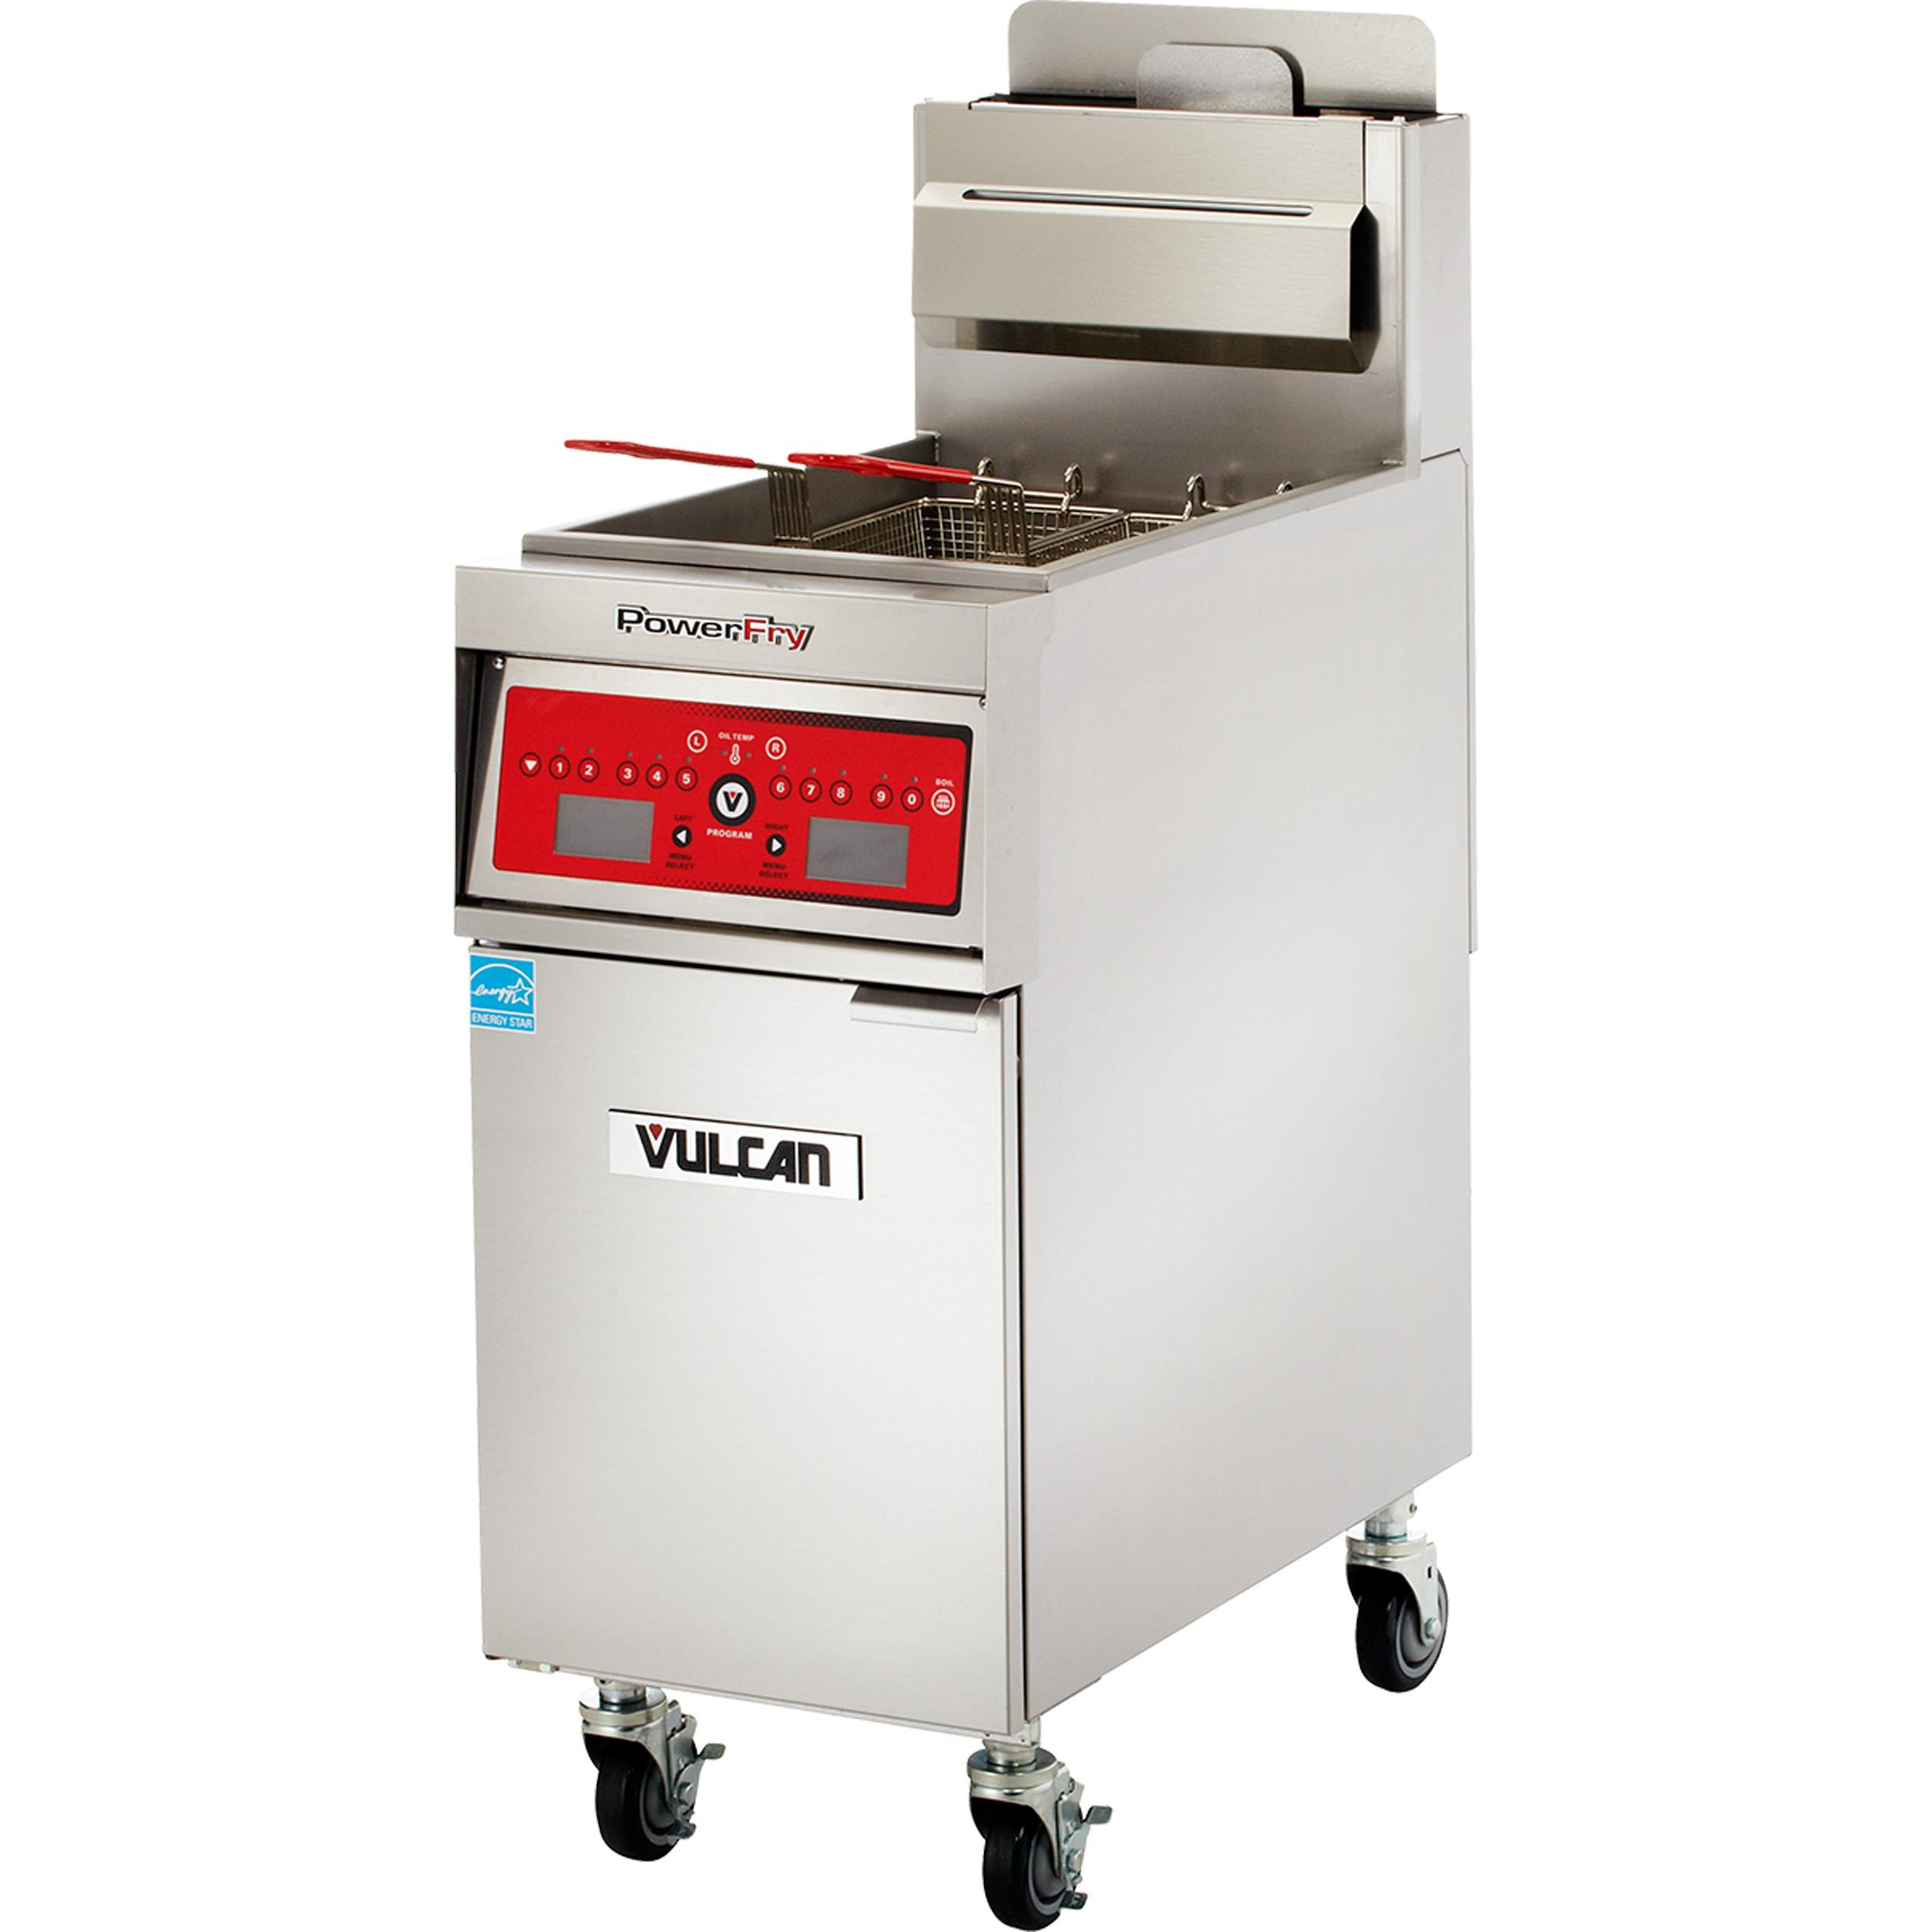 Vulcan 1VK85CF fryer, gas, floor model, full pot